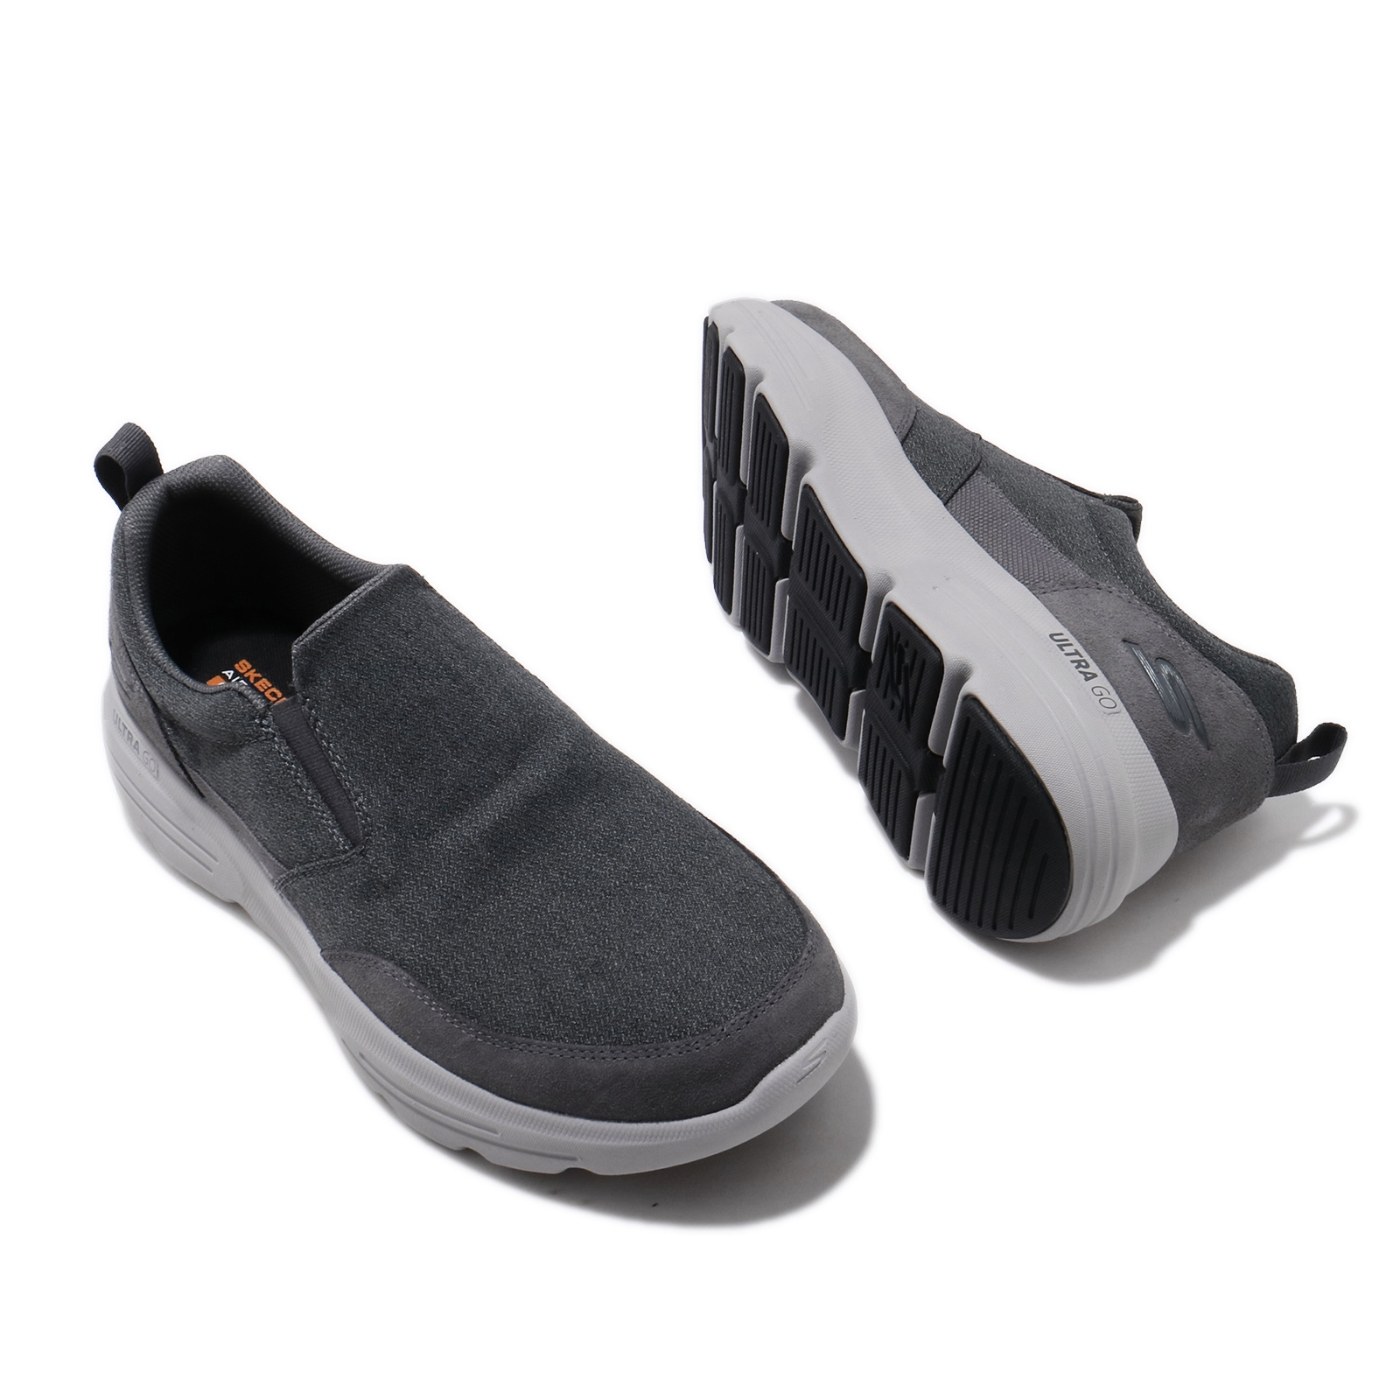 Skechers 休閒鞋 Go Walk Duro 套入式 男鞋 踏青 健走 外出 輕便 好穿脫 懶人鞋 灰 216008CHAR